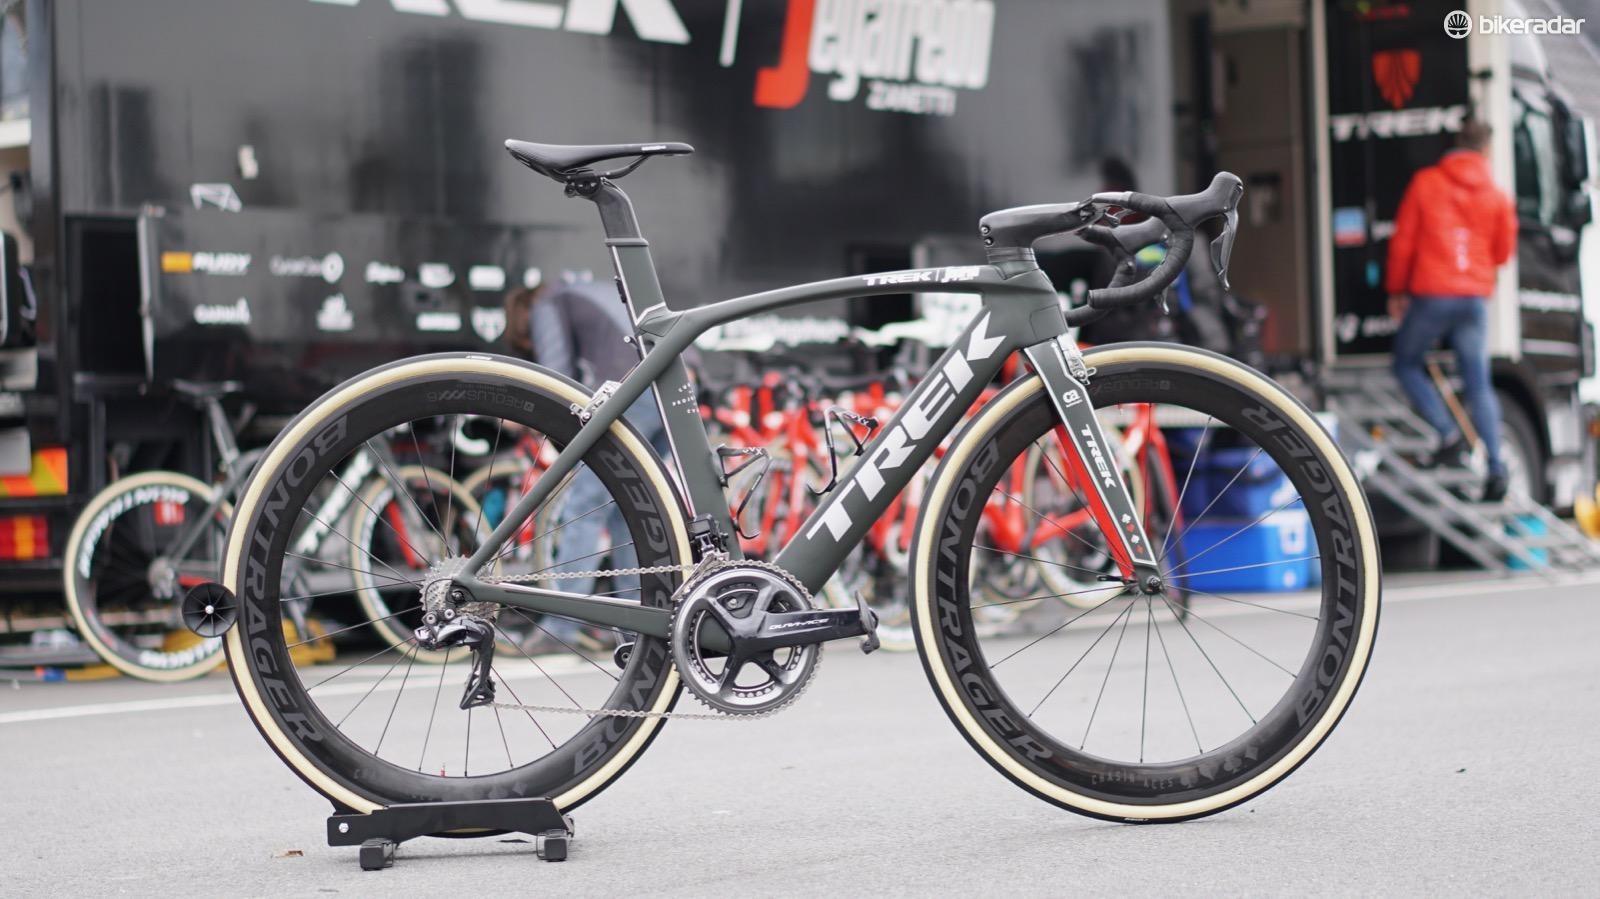 Trek-Segafredo's John Degenkolb has custom new Aeolus XXX wheels for his Trek Madone, but he is riding a special Madone for the Tour of Flanders